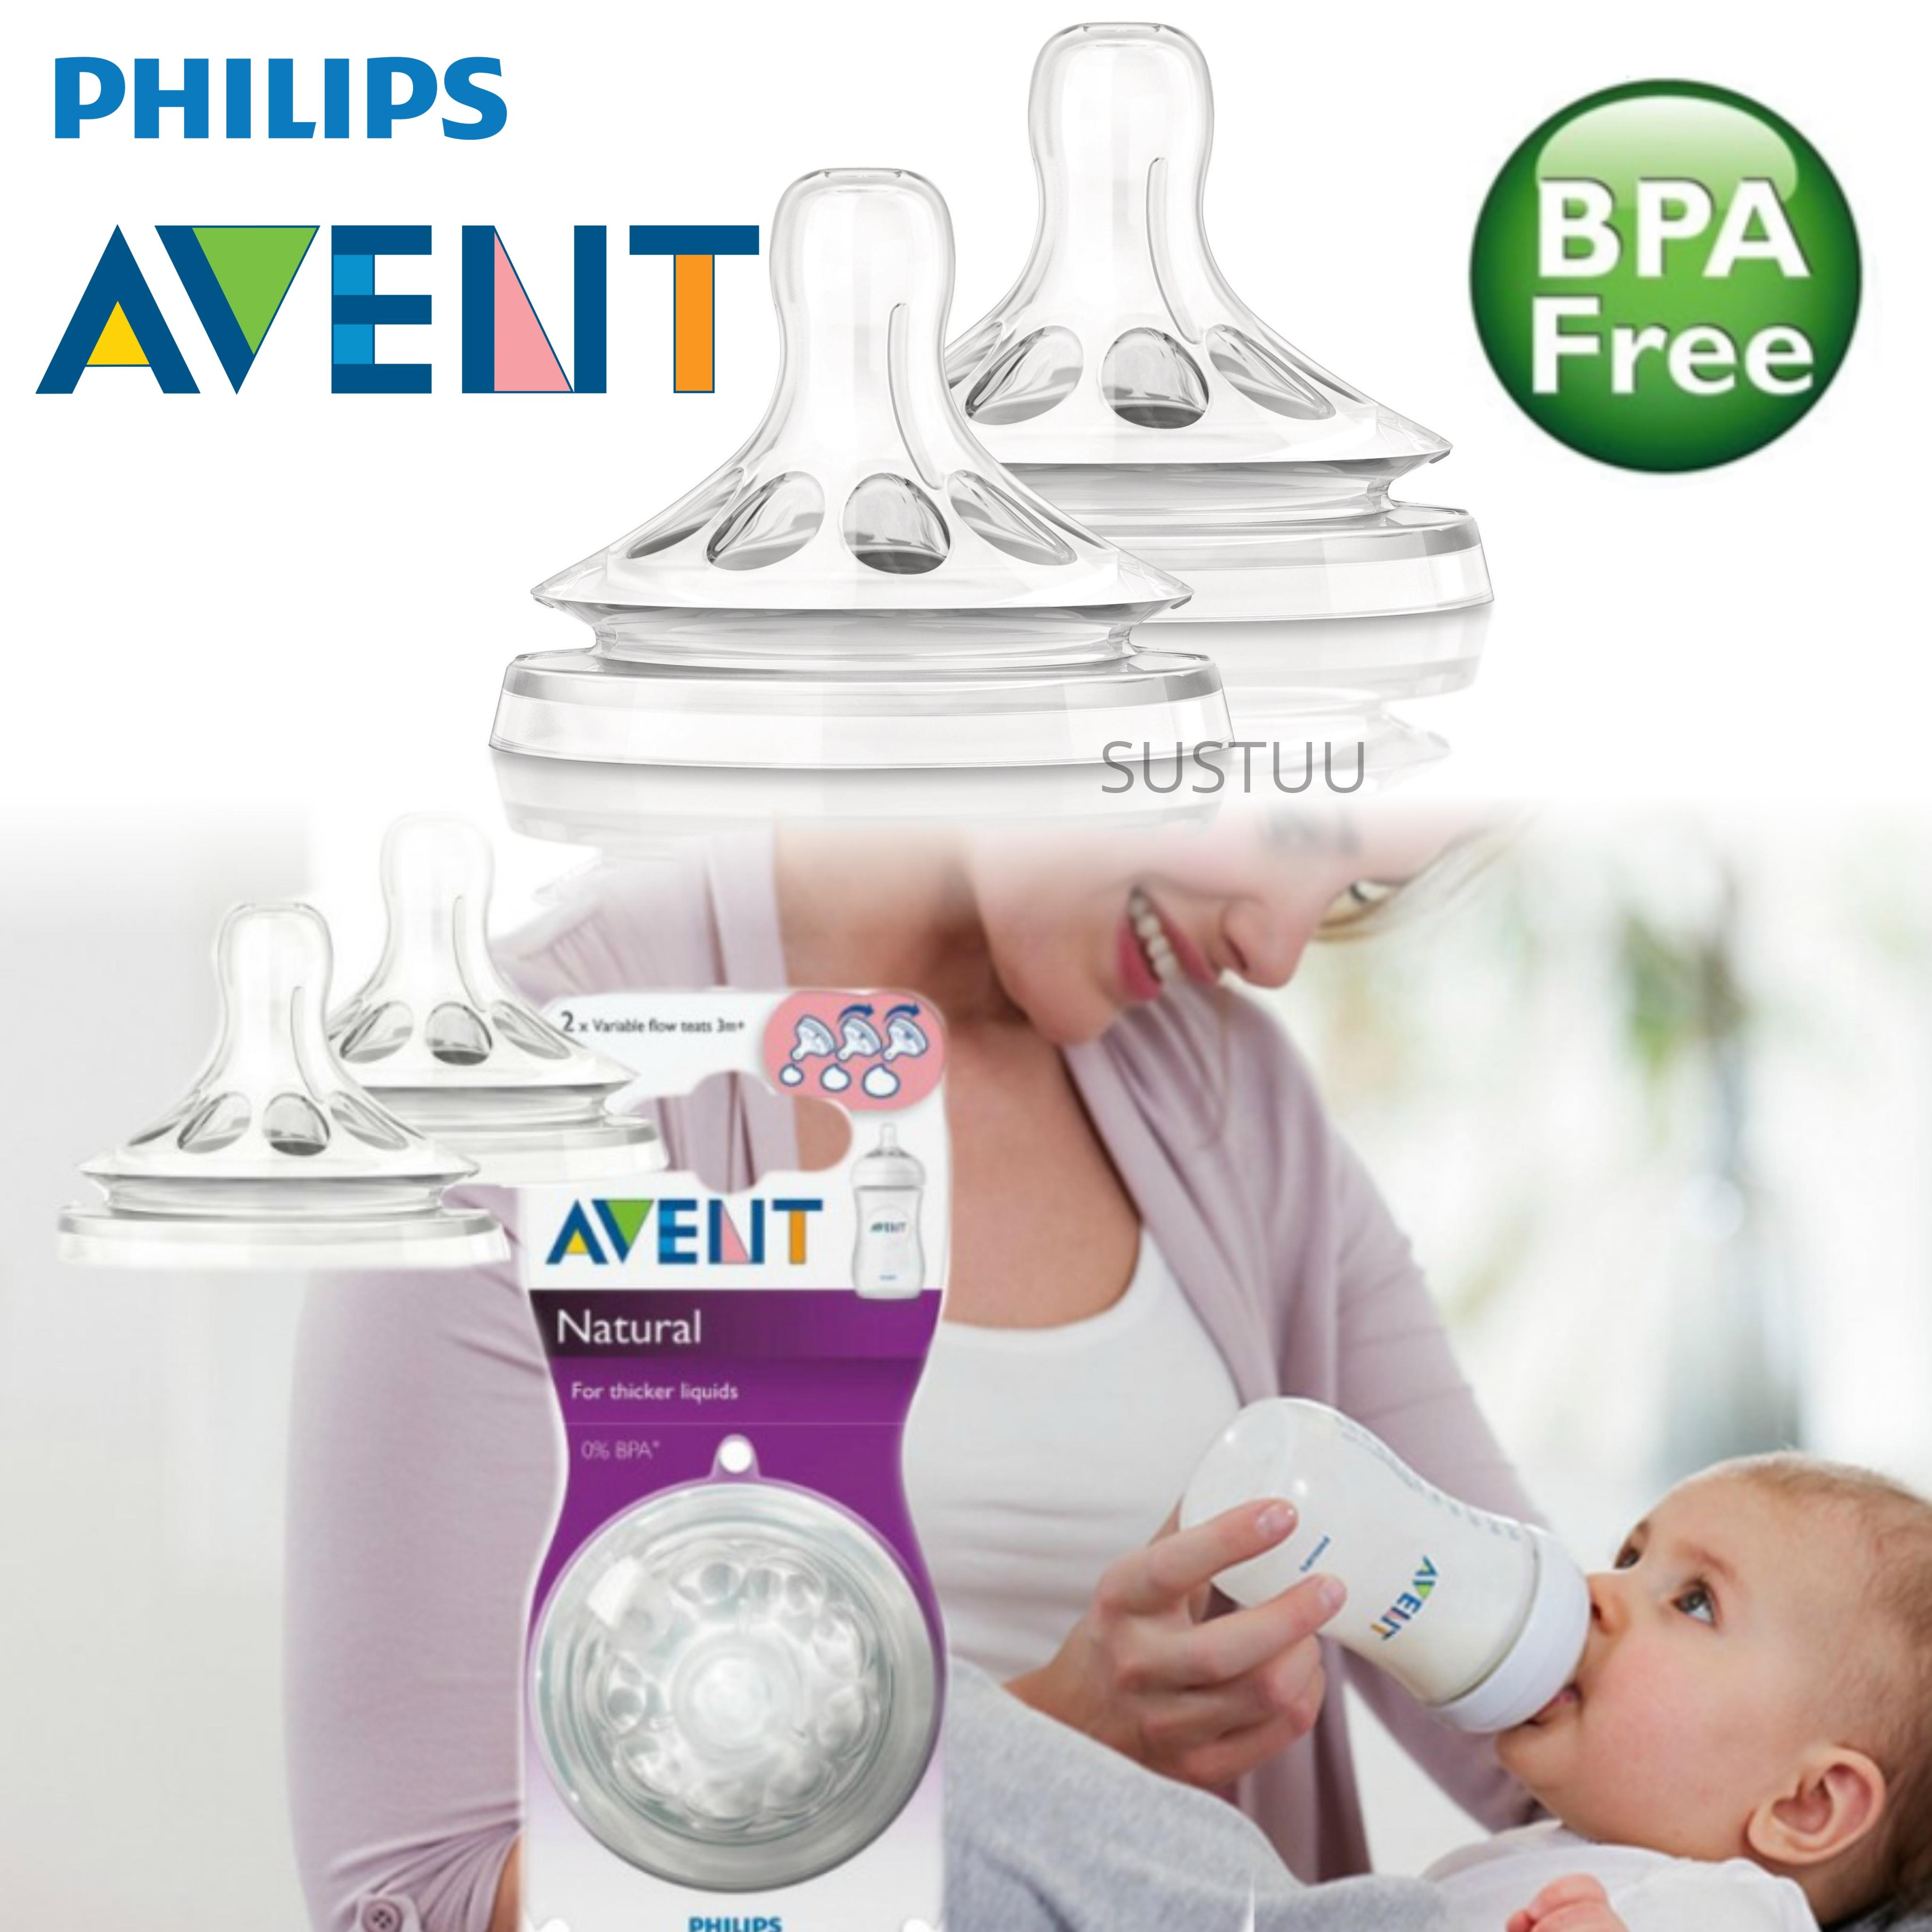 Philips Avent Natural Teat Vari Flow|Baby's Feeding Accessories|Twin Valve|2pk|